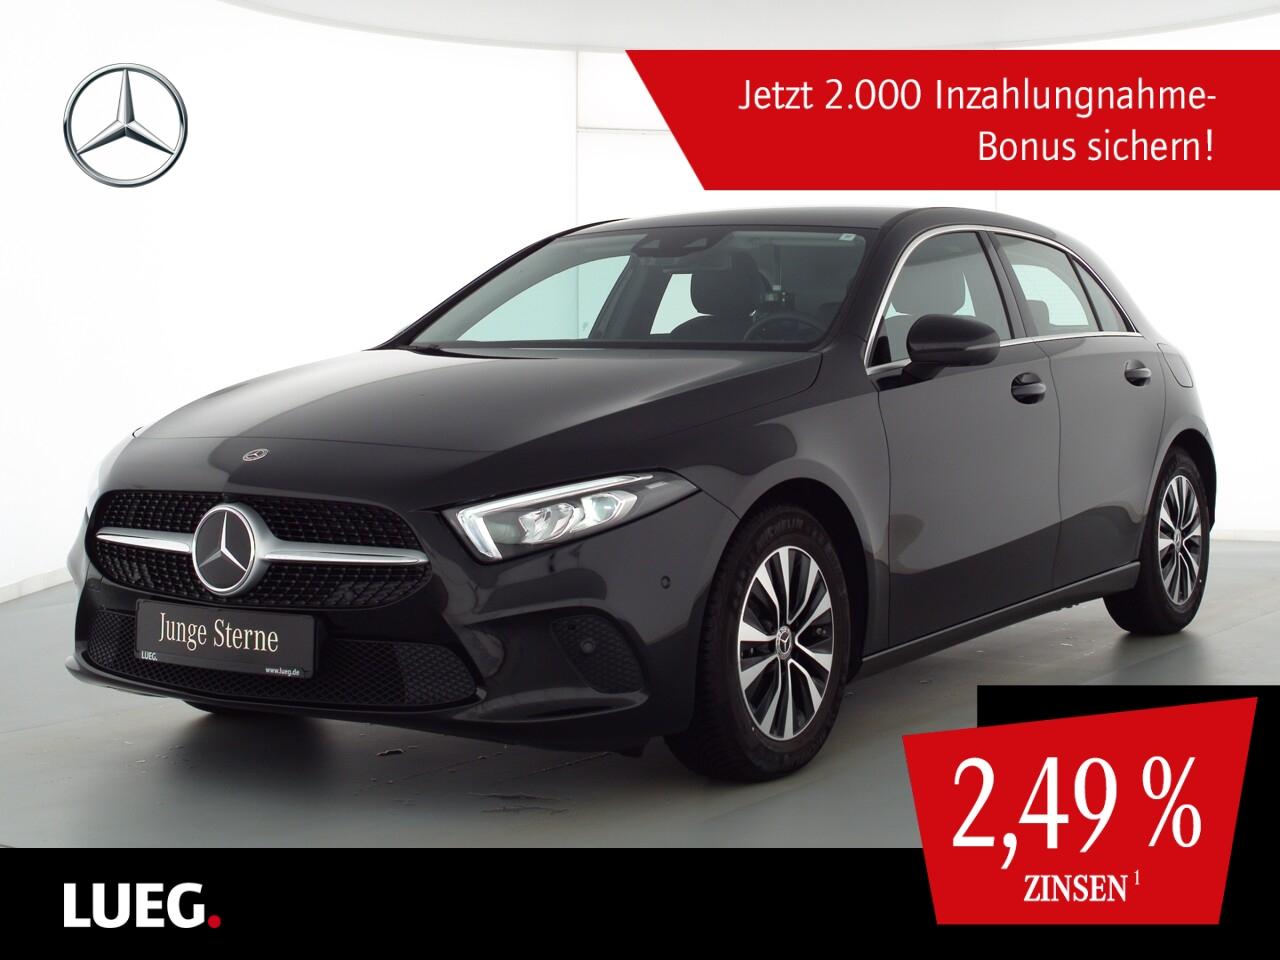 Mercedes-Benz A 200 d Progressive+MBUXHighEnd+LED-HP+Distr+360, Jahr 2020, Diesel